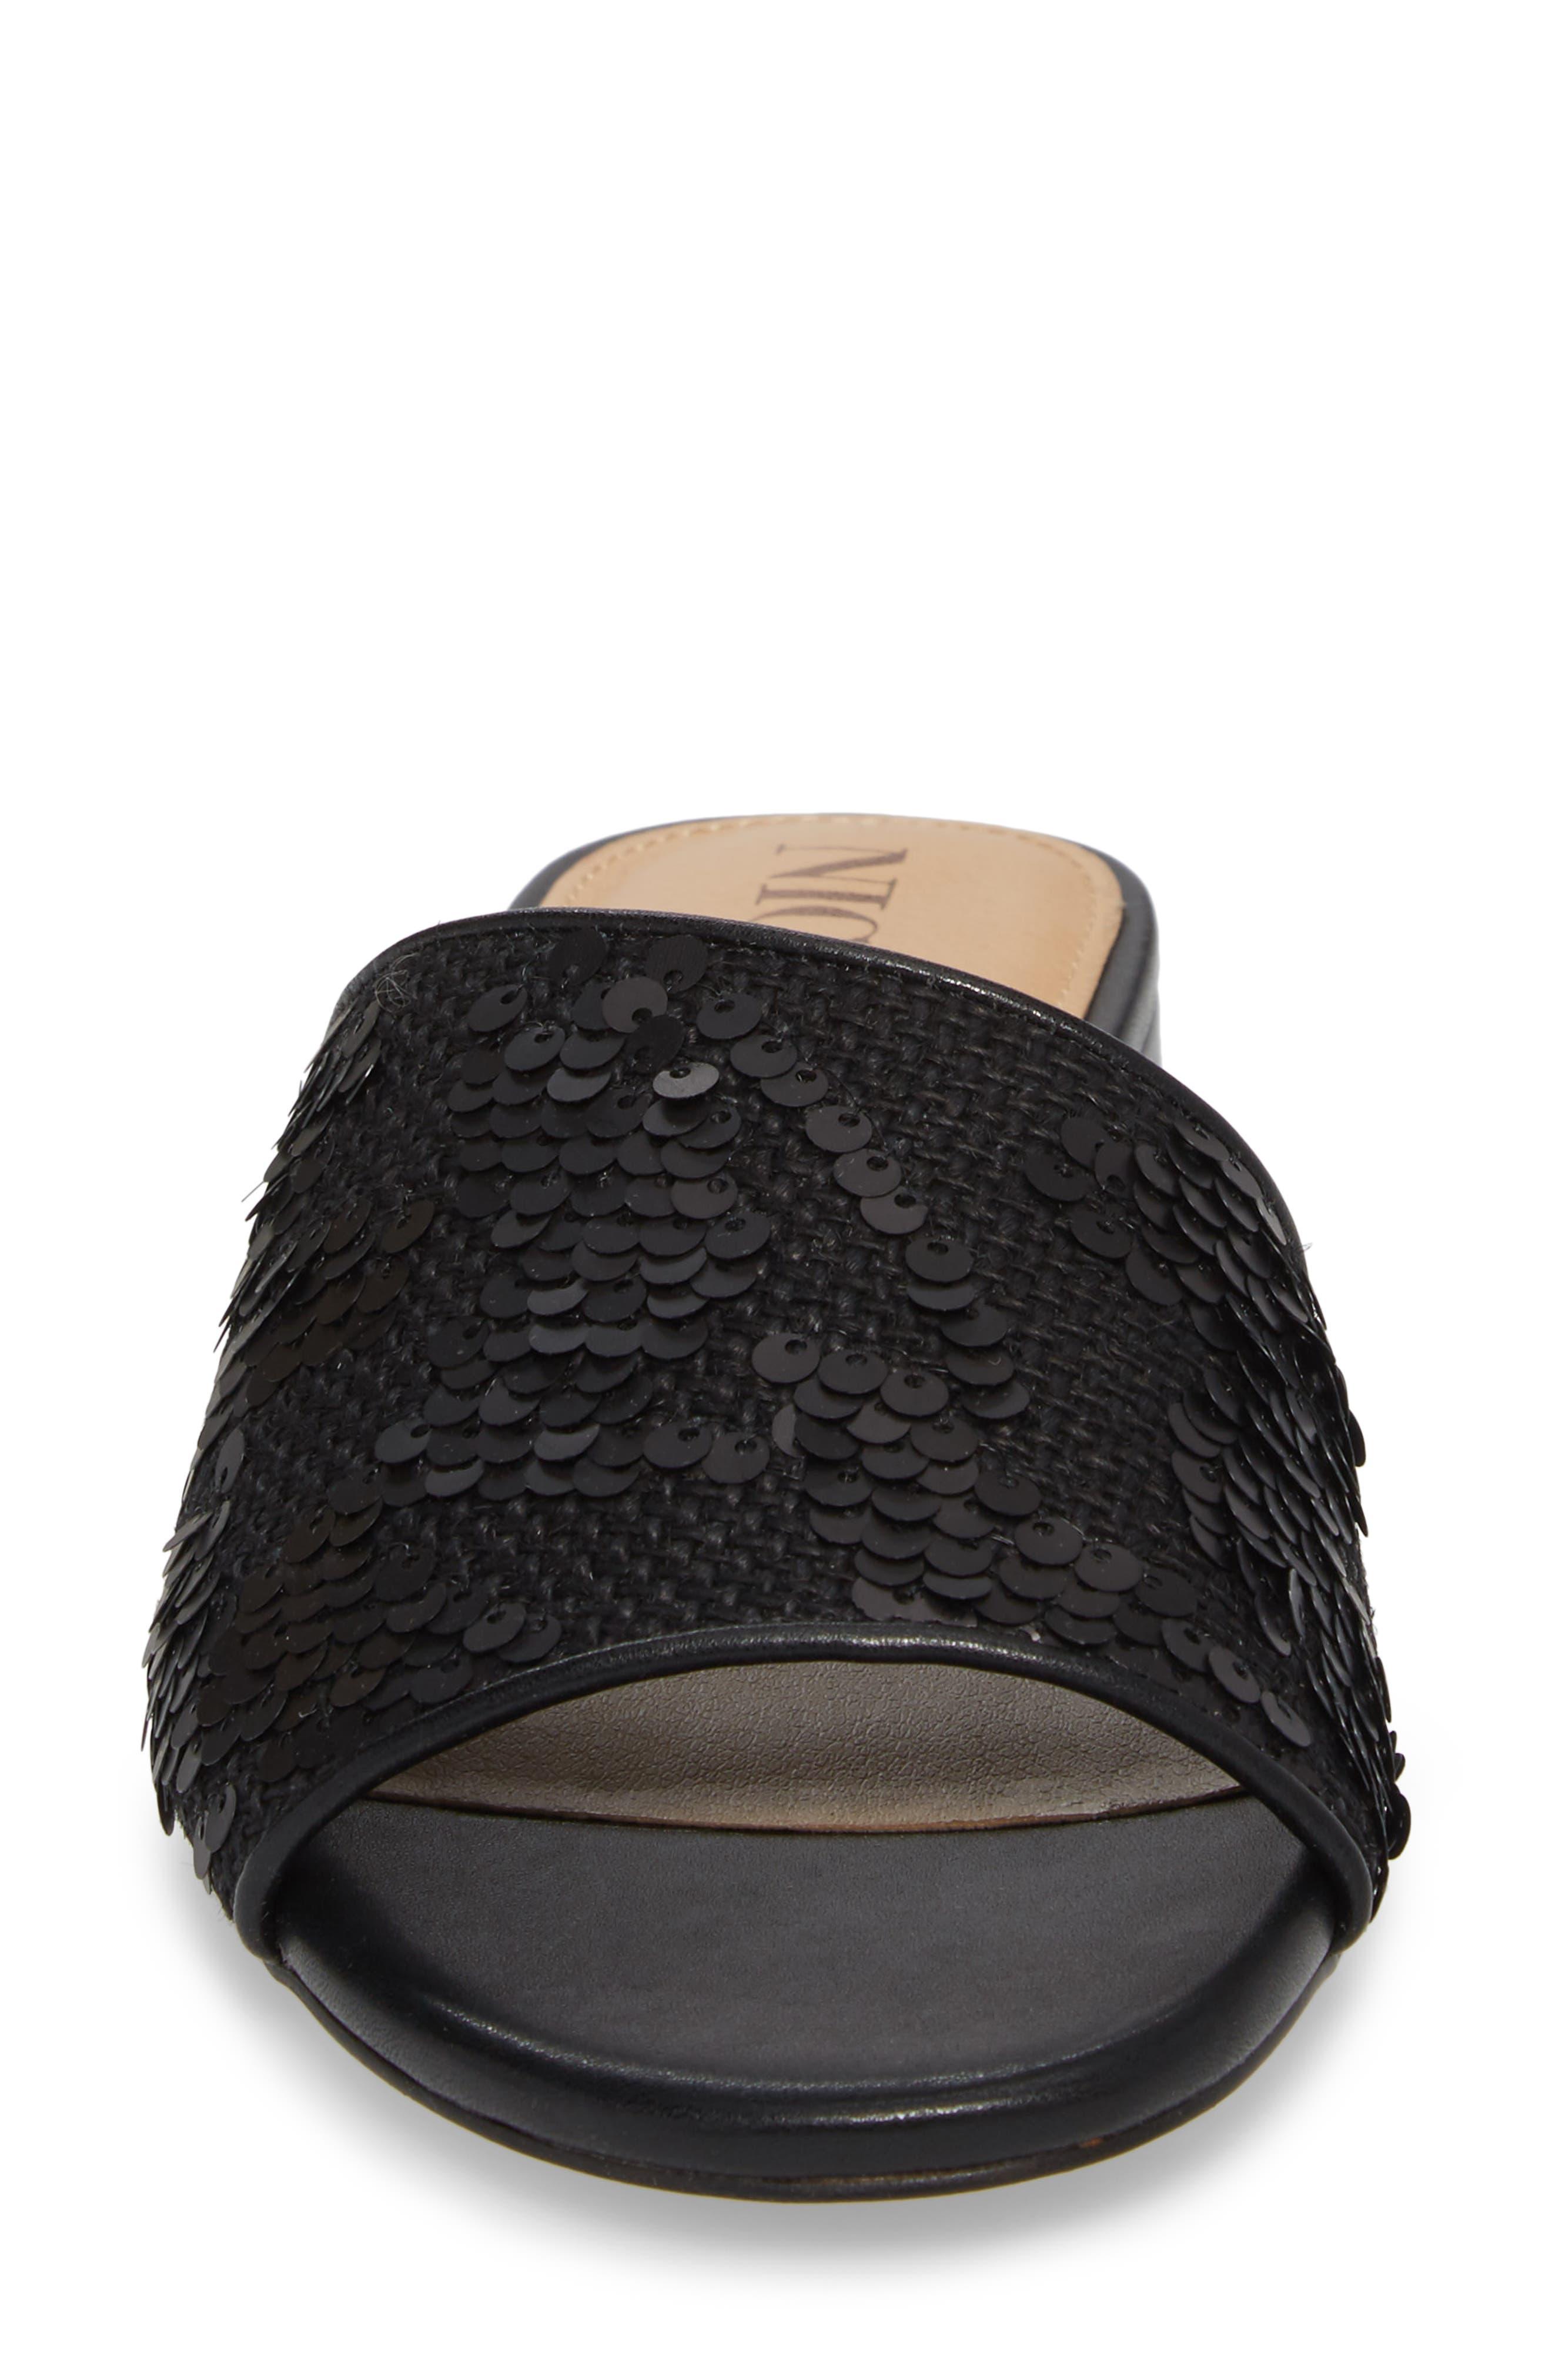 Stella Slide Sandal,                             Alternate thumbnail 4, color,                             Black Sequin Fabric